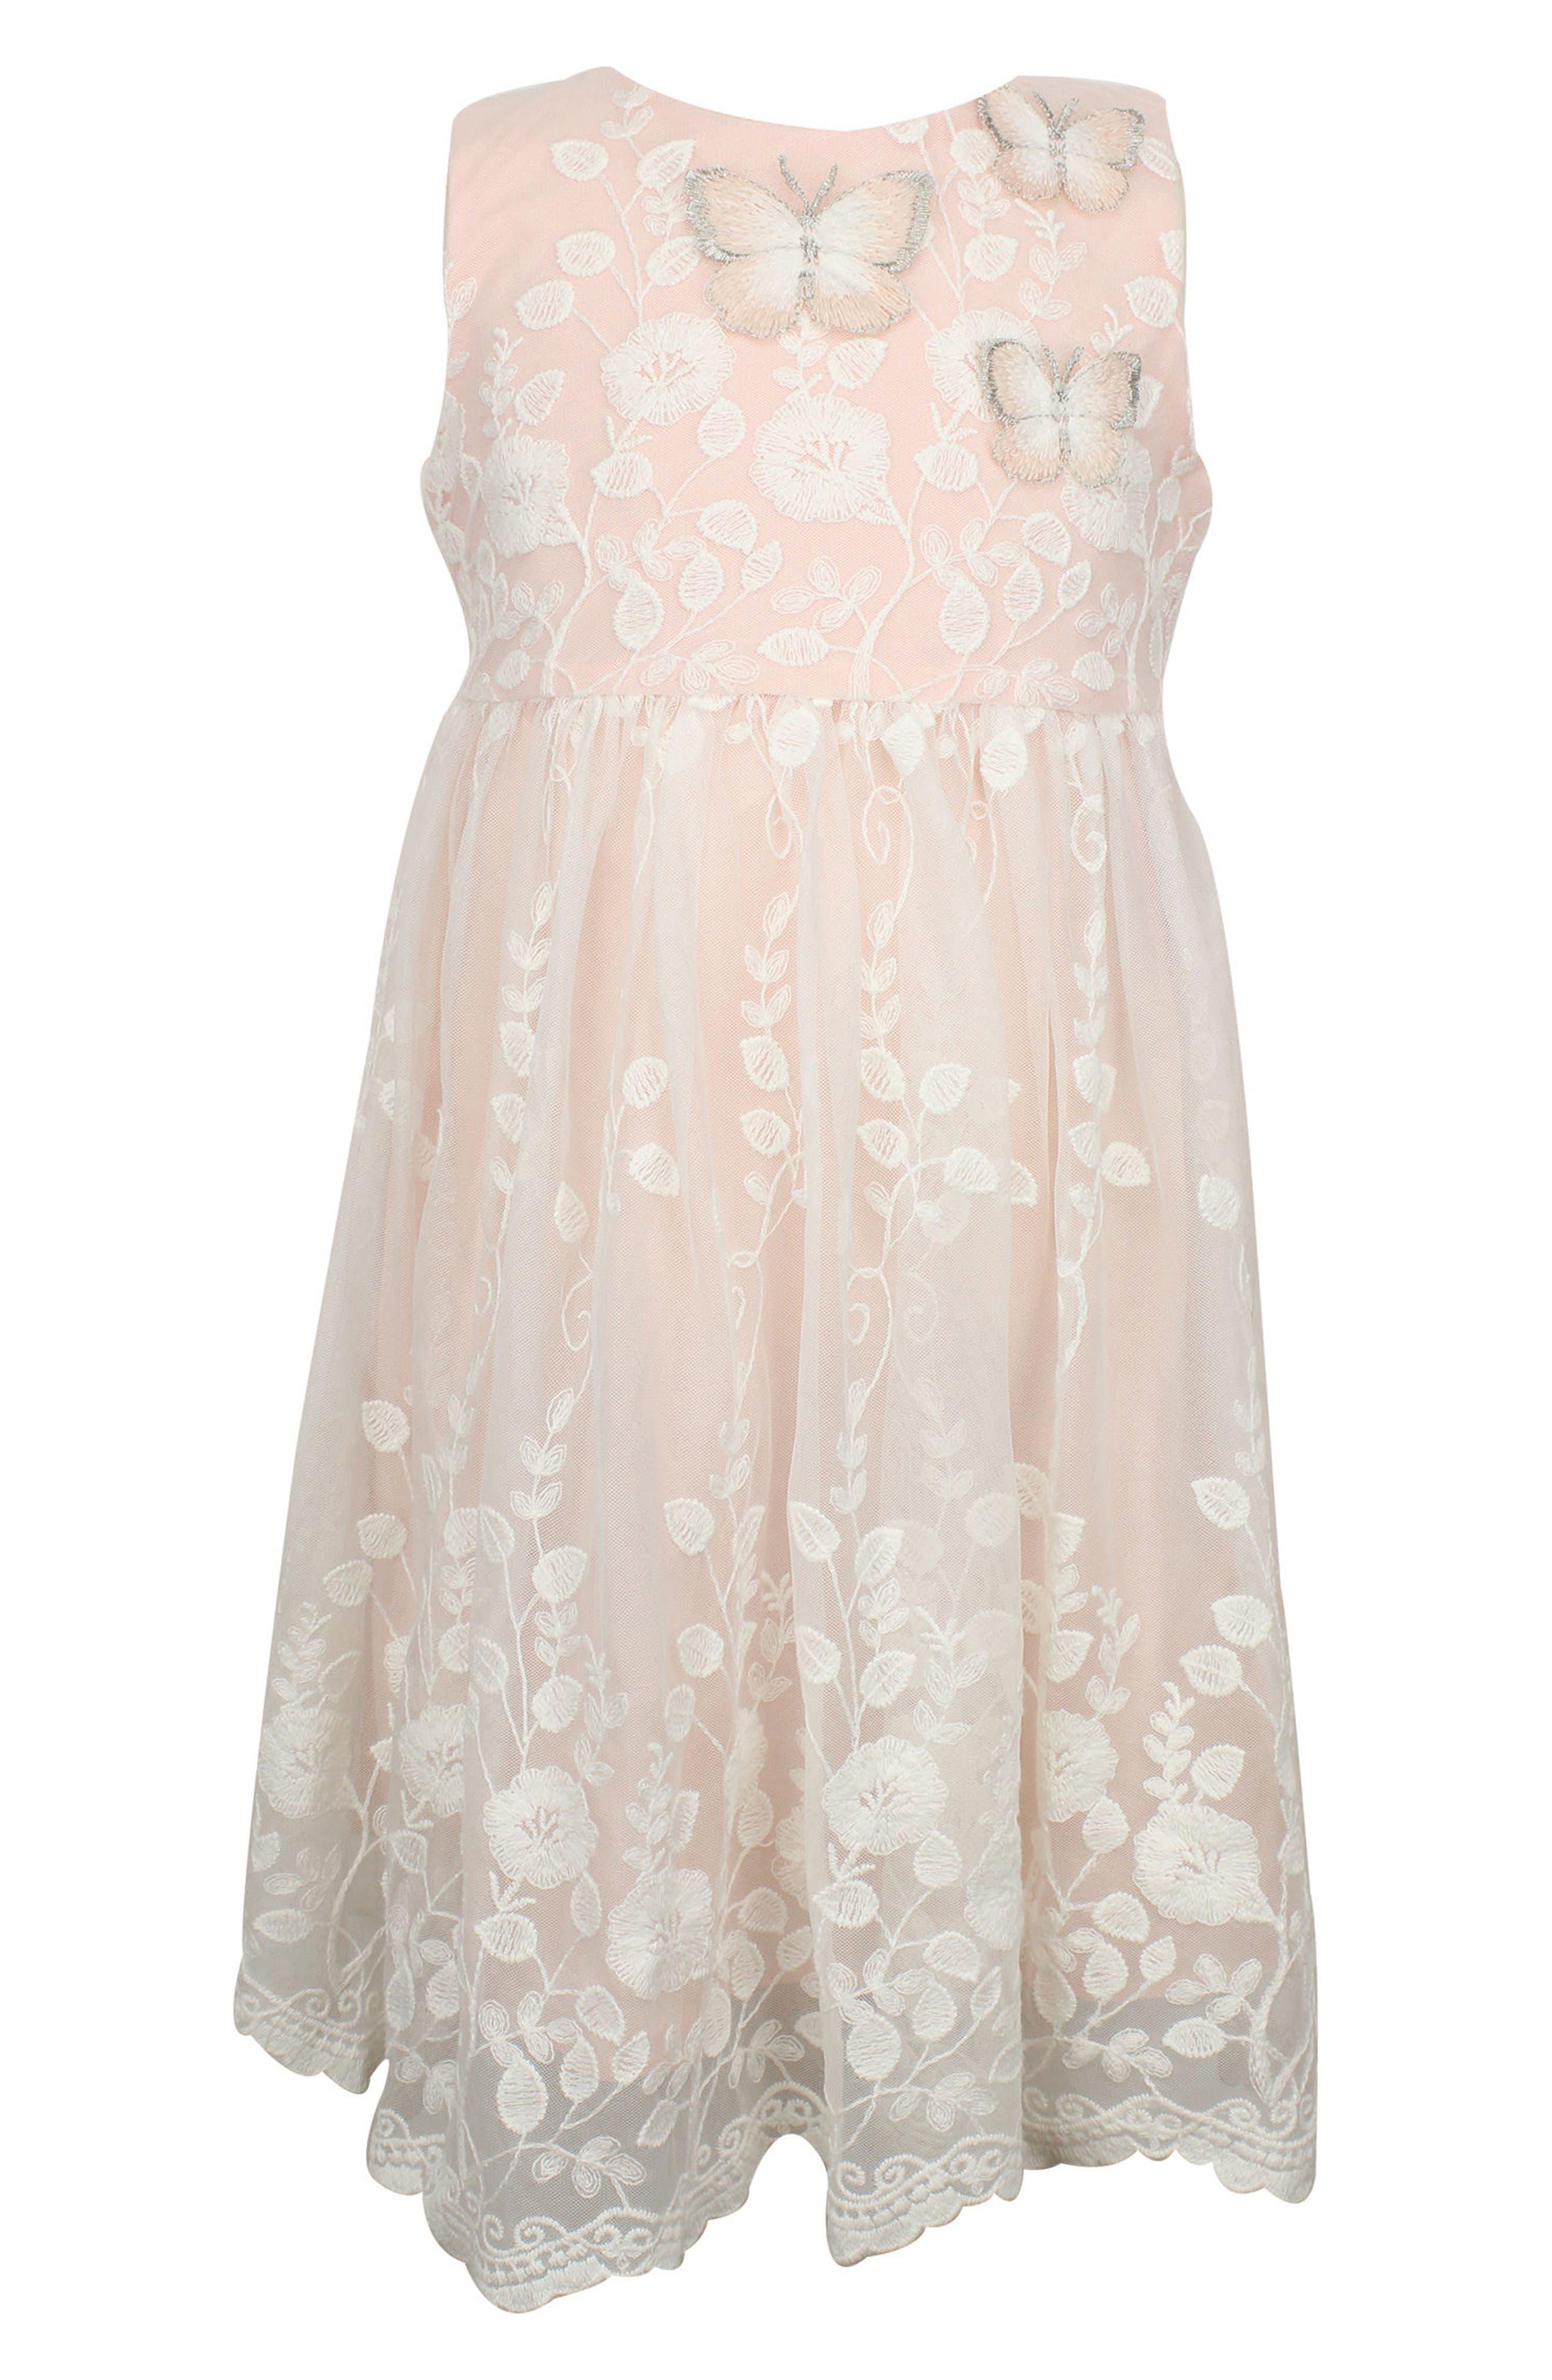 POPATU Lace Overlay Sleeveless Dress, Main, color, IVORY